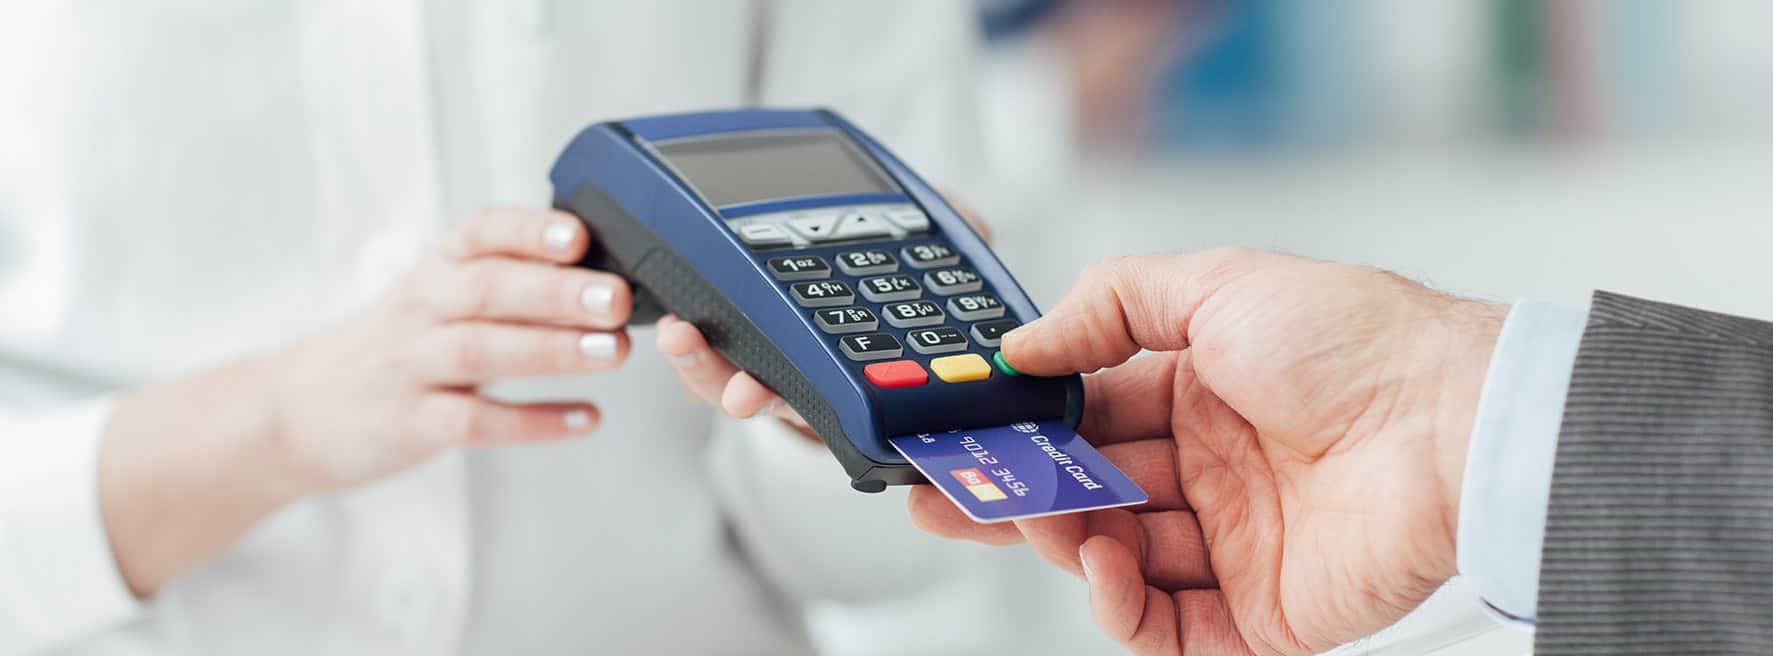 Credit card transaction PIN